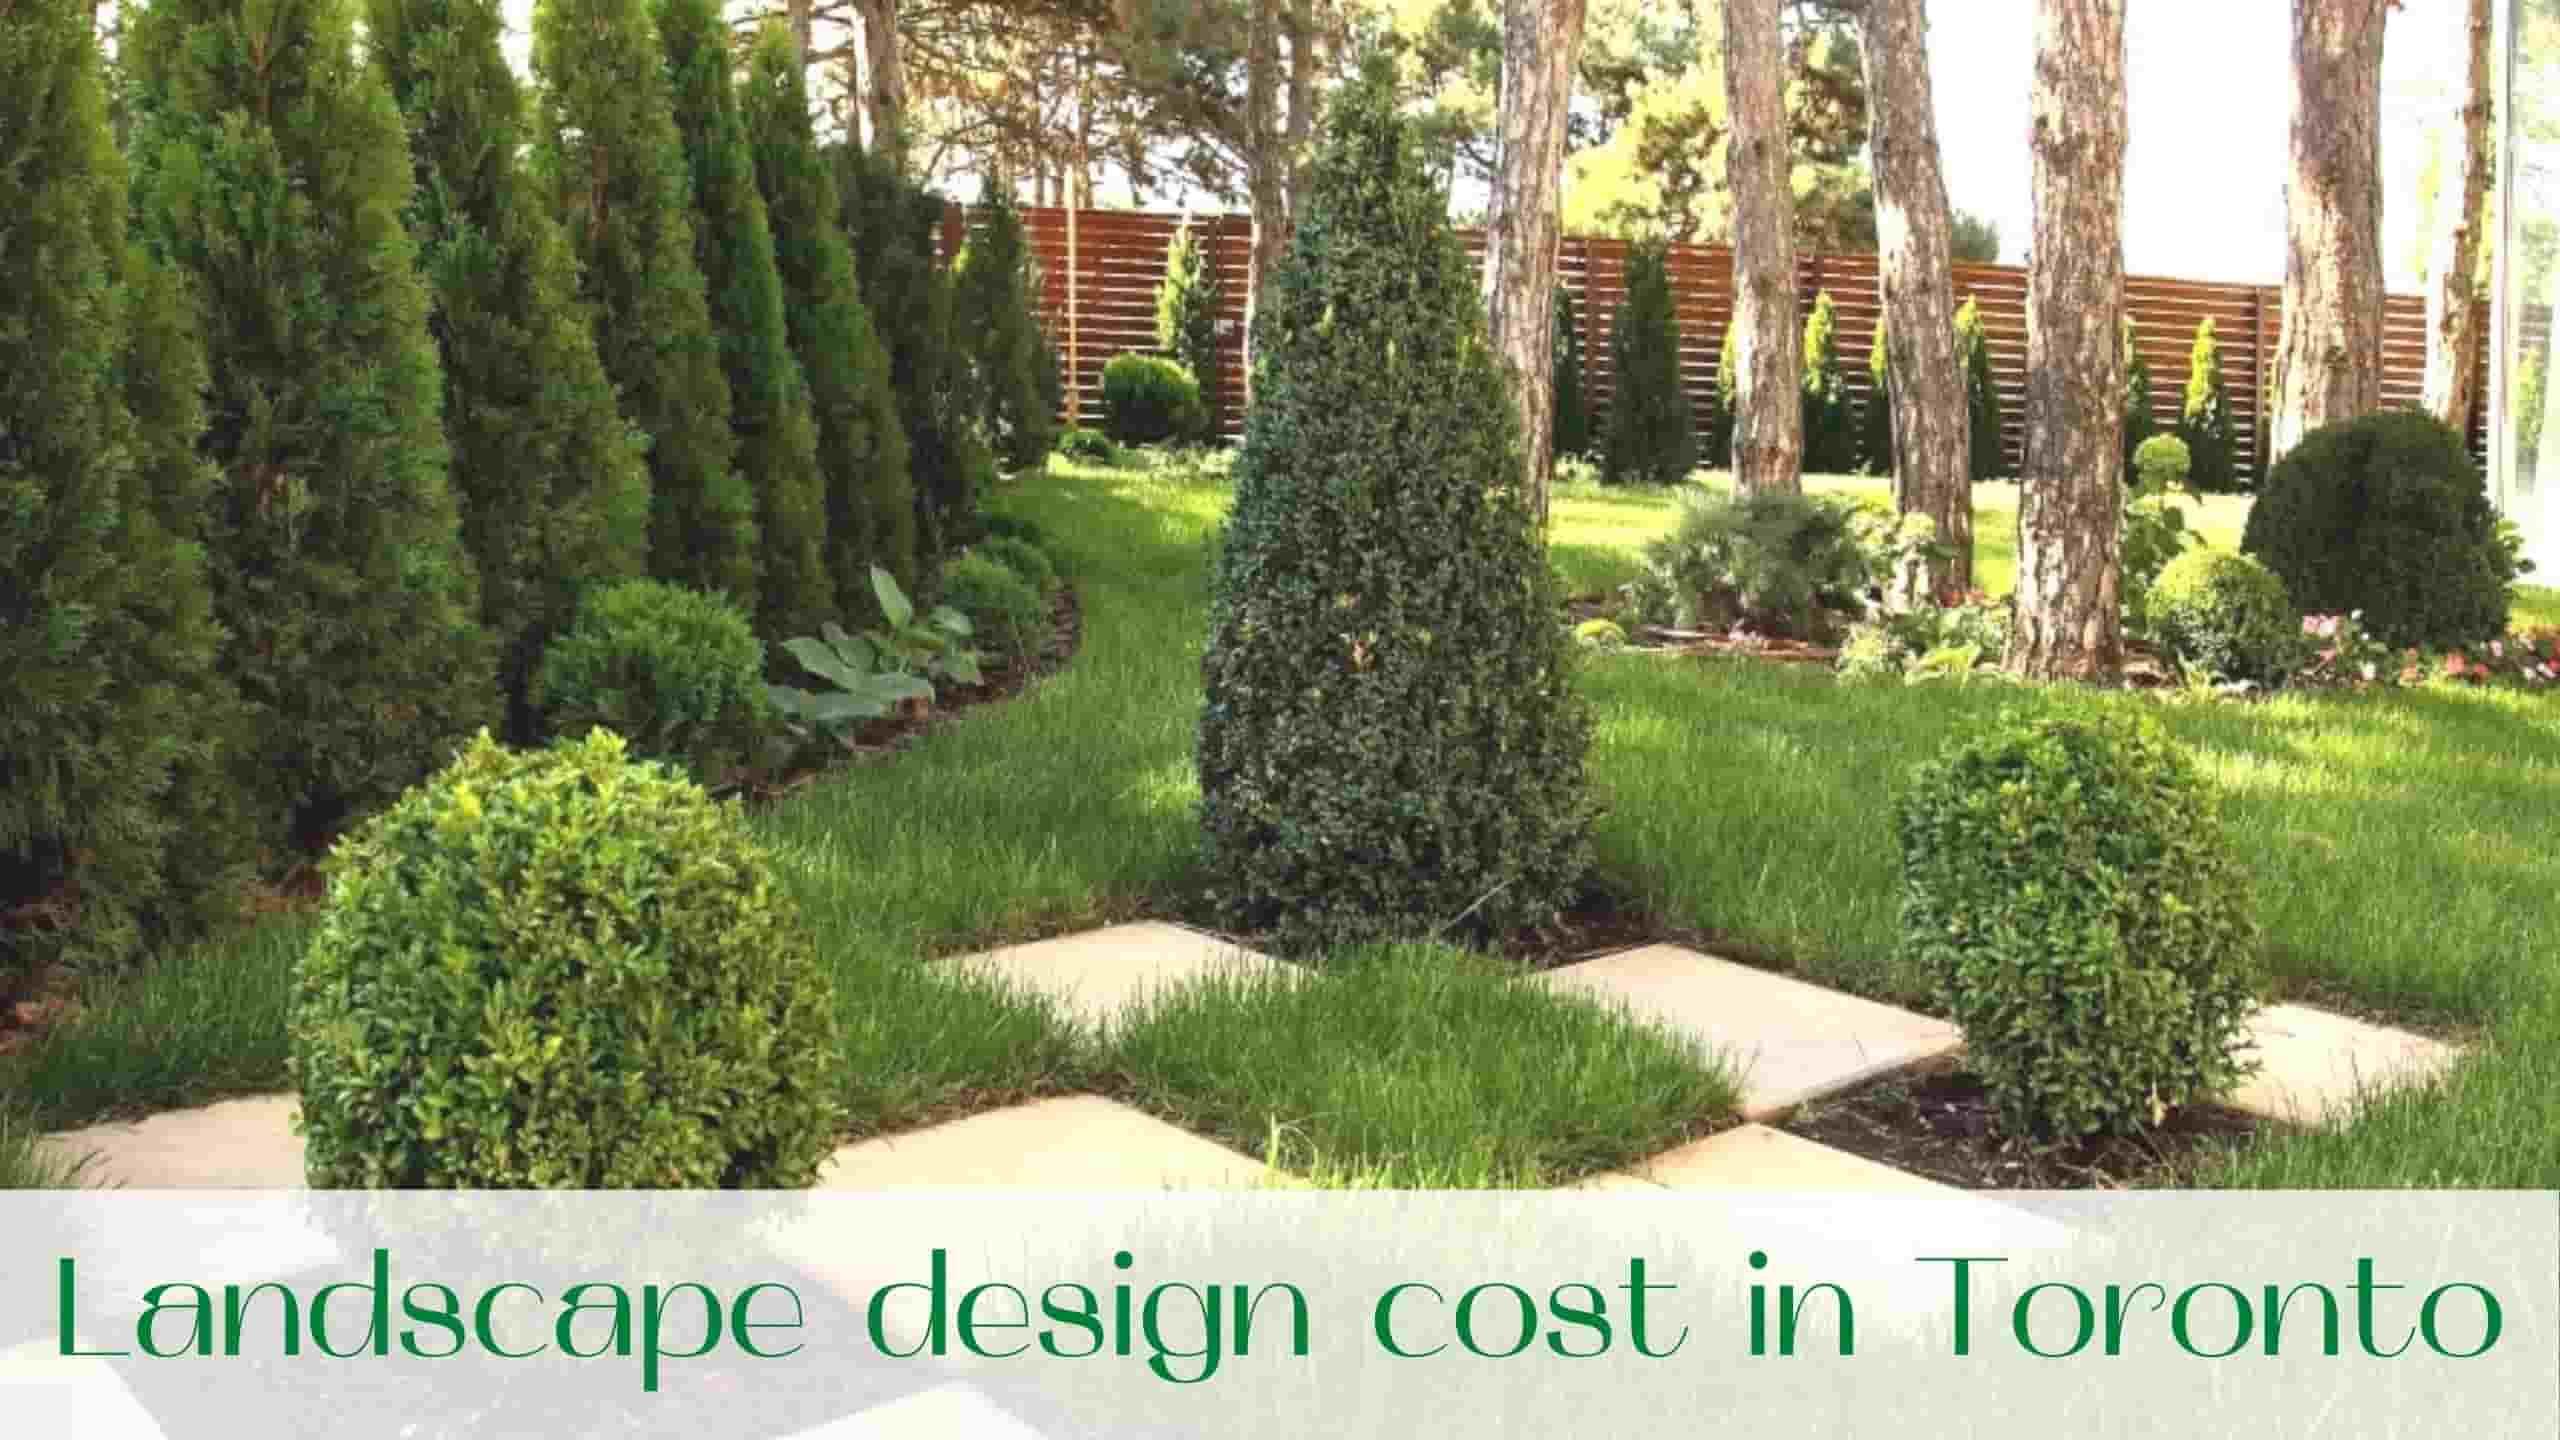 image-landscape-design-cost-in-toronto